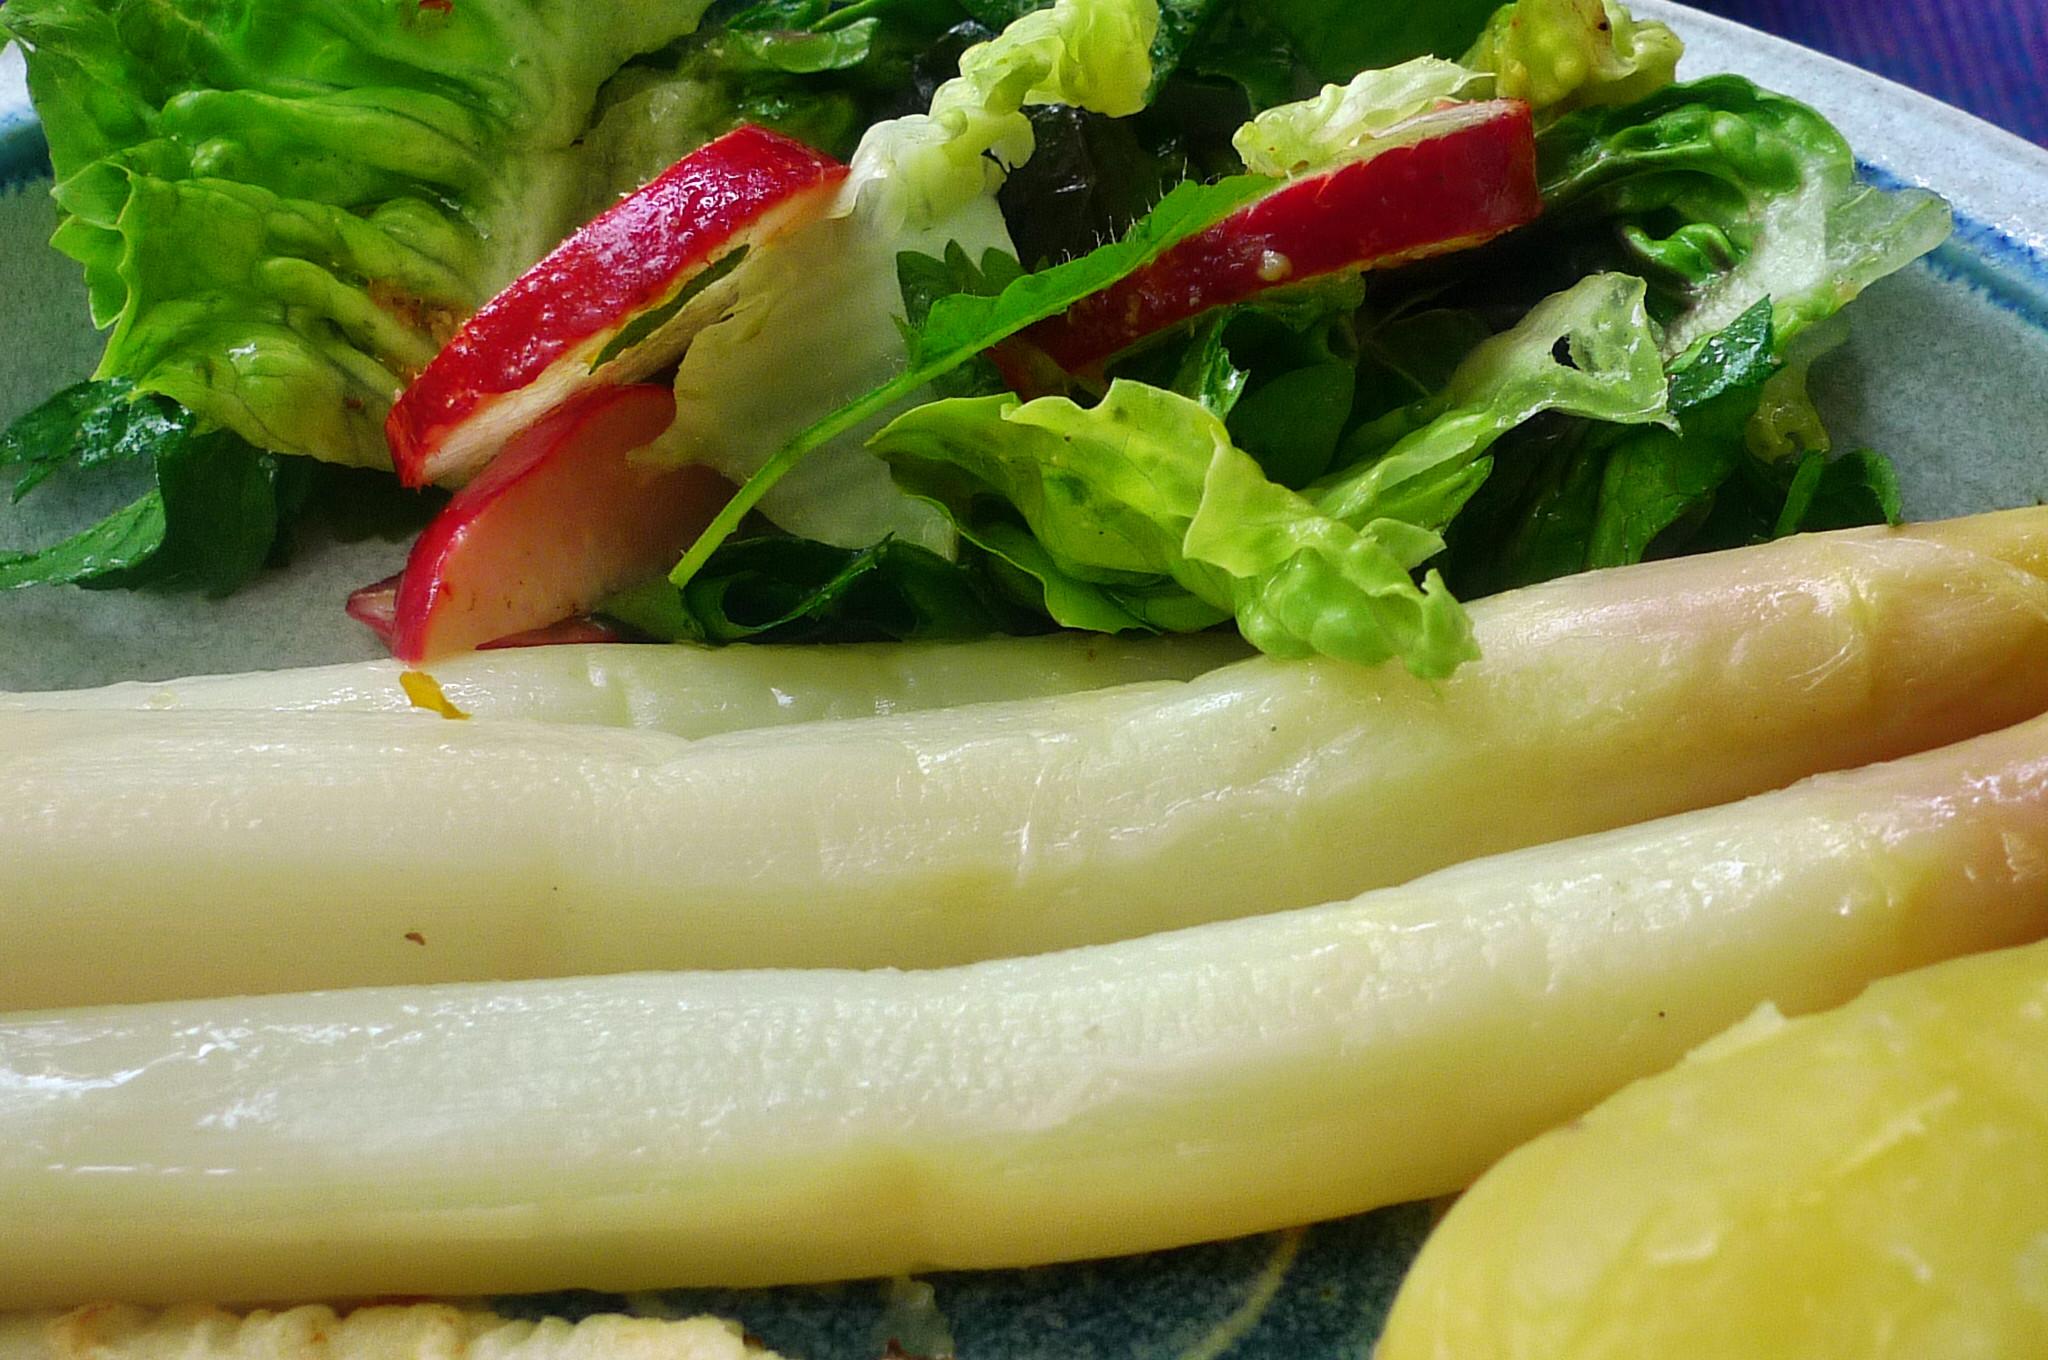 Kabeljau,Spargel,Kartoffel,Salat -15.5.15   (9)